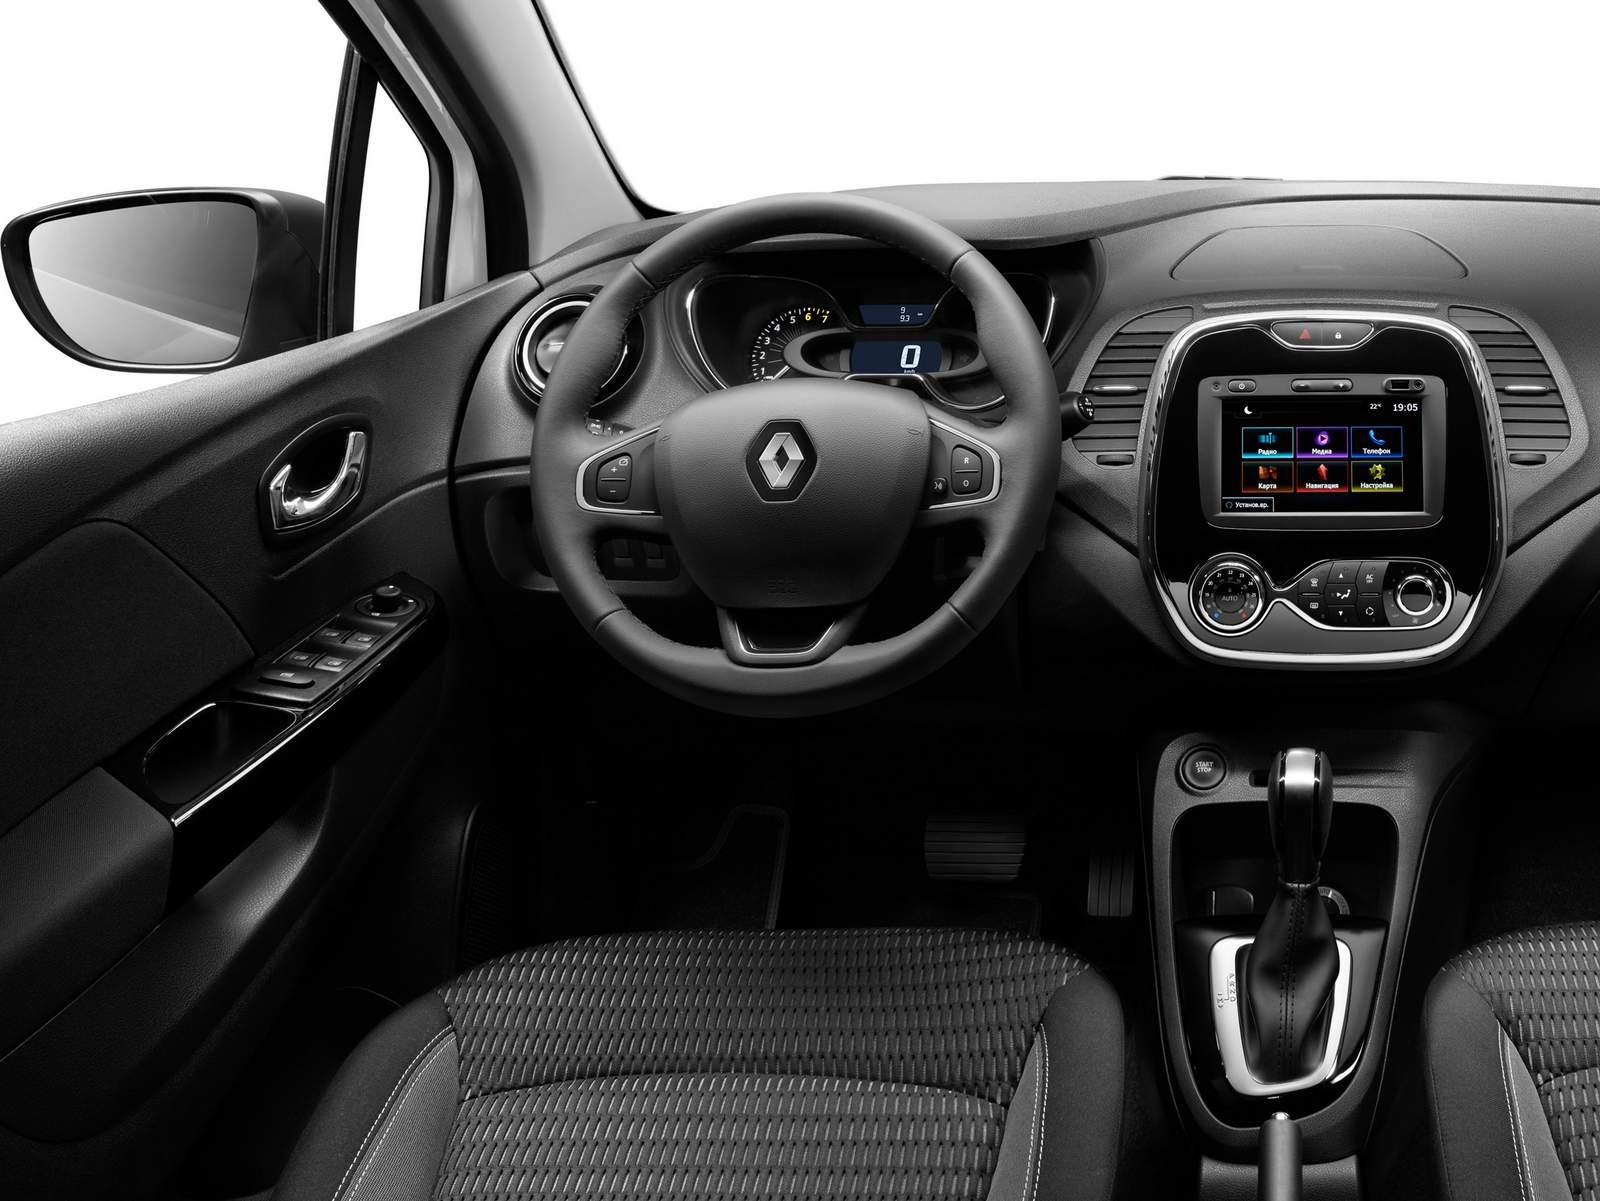 Renault duster autom tica 2017 trocar c mbio at4 por cvt car blog br - Dacia duster 2017 interior ...